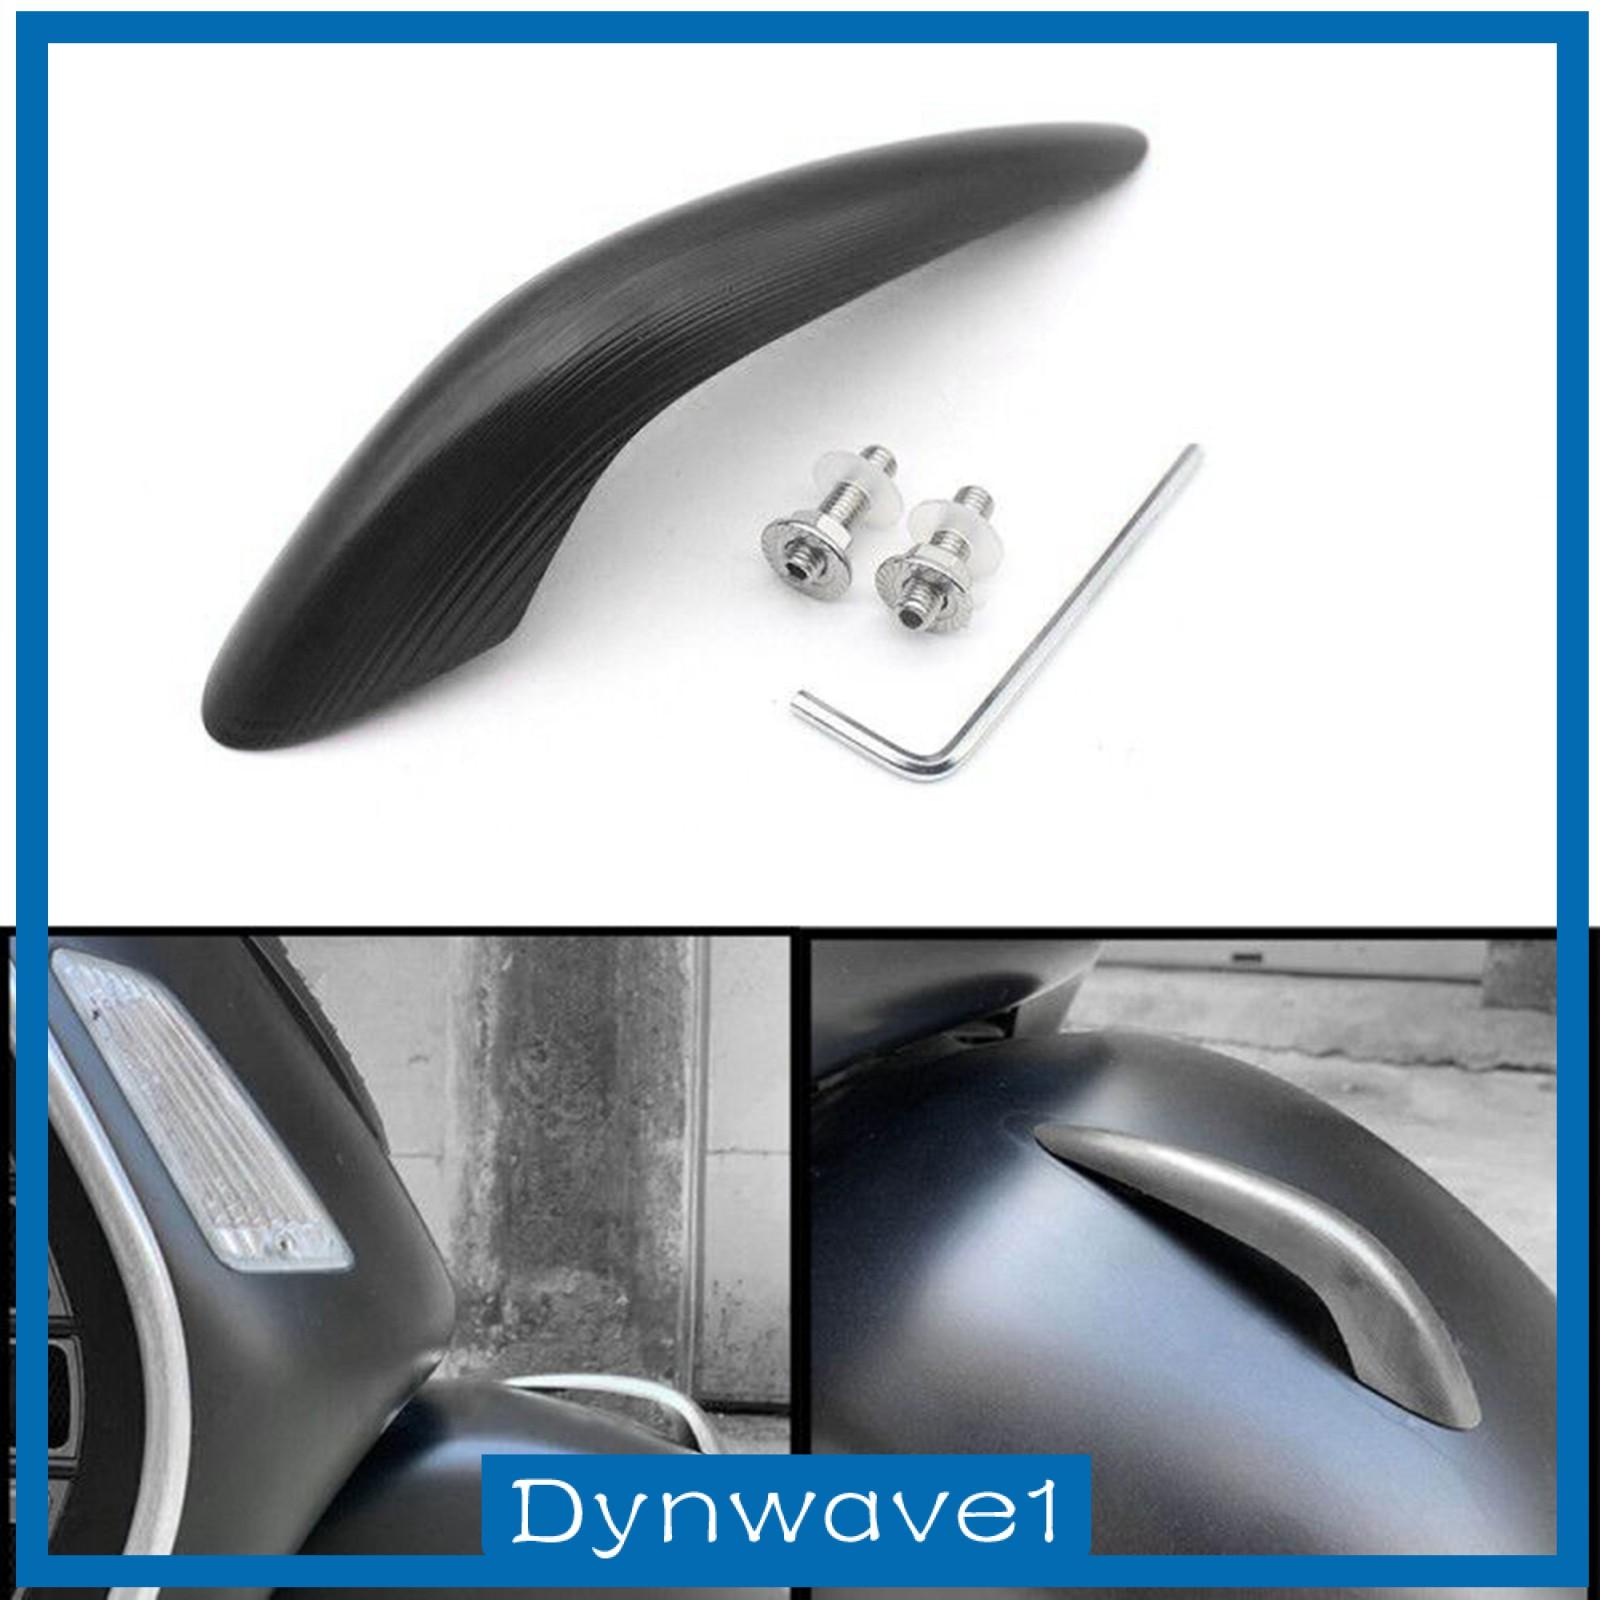 FENDER [Dynwave1] Vespa Gts Gtv 250300 的前擋泥板擋泥板鼻喙裝飾配件